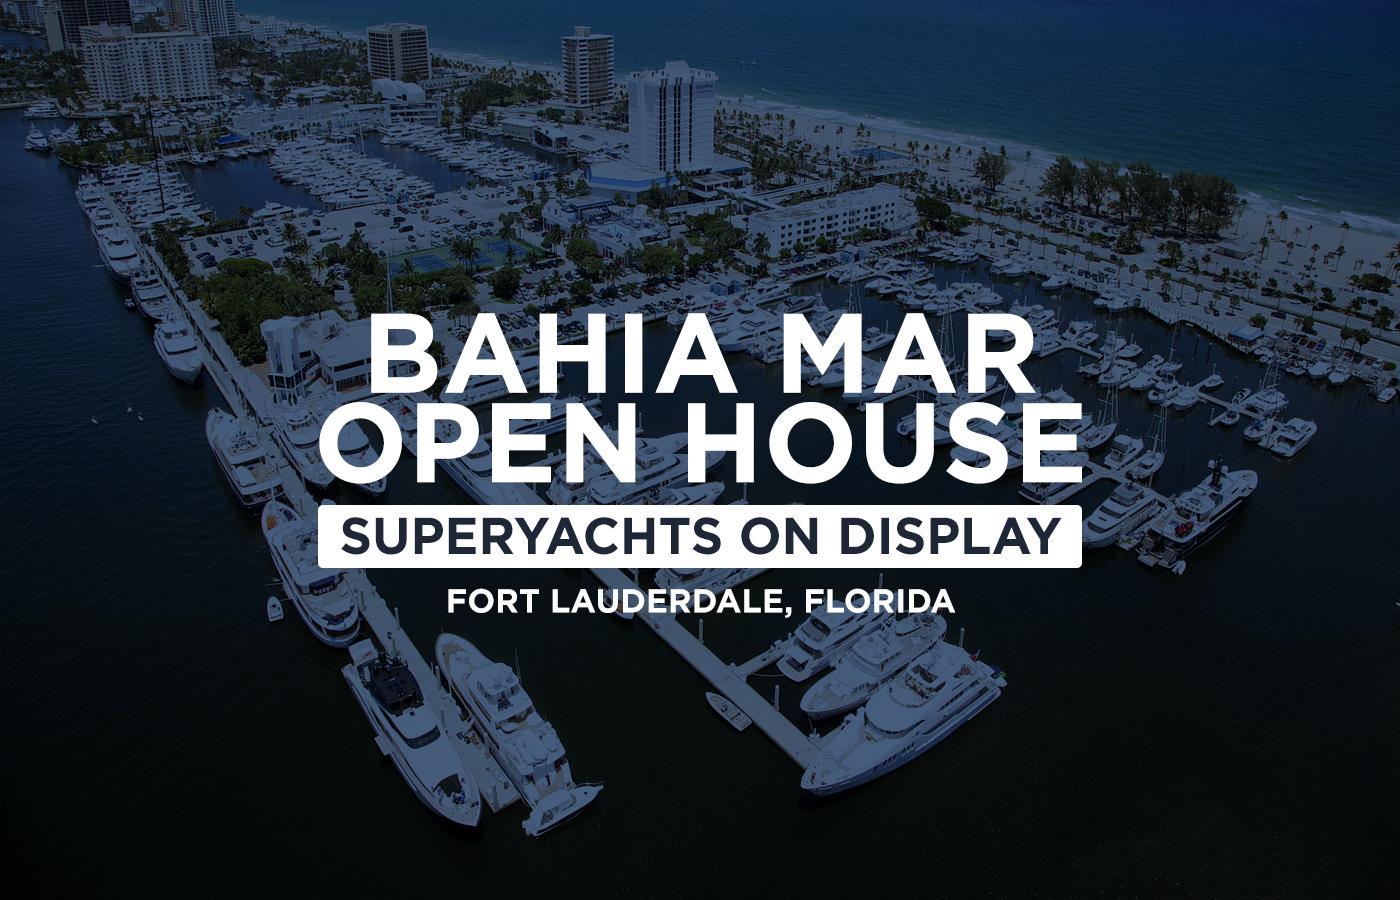 Bahia Mar Open House [Superyachts On Display]